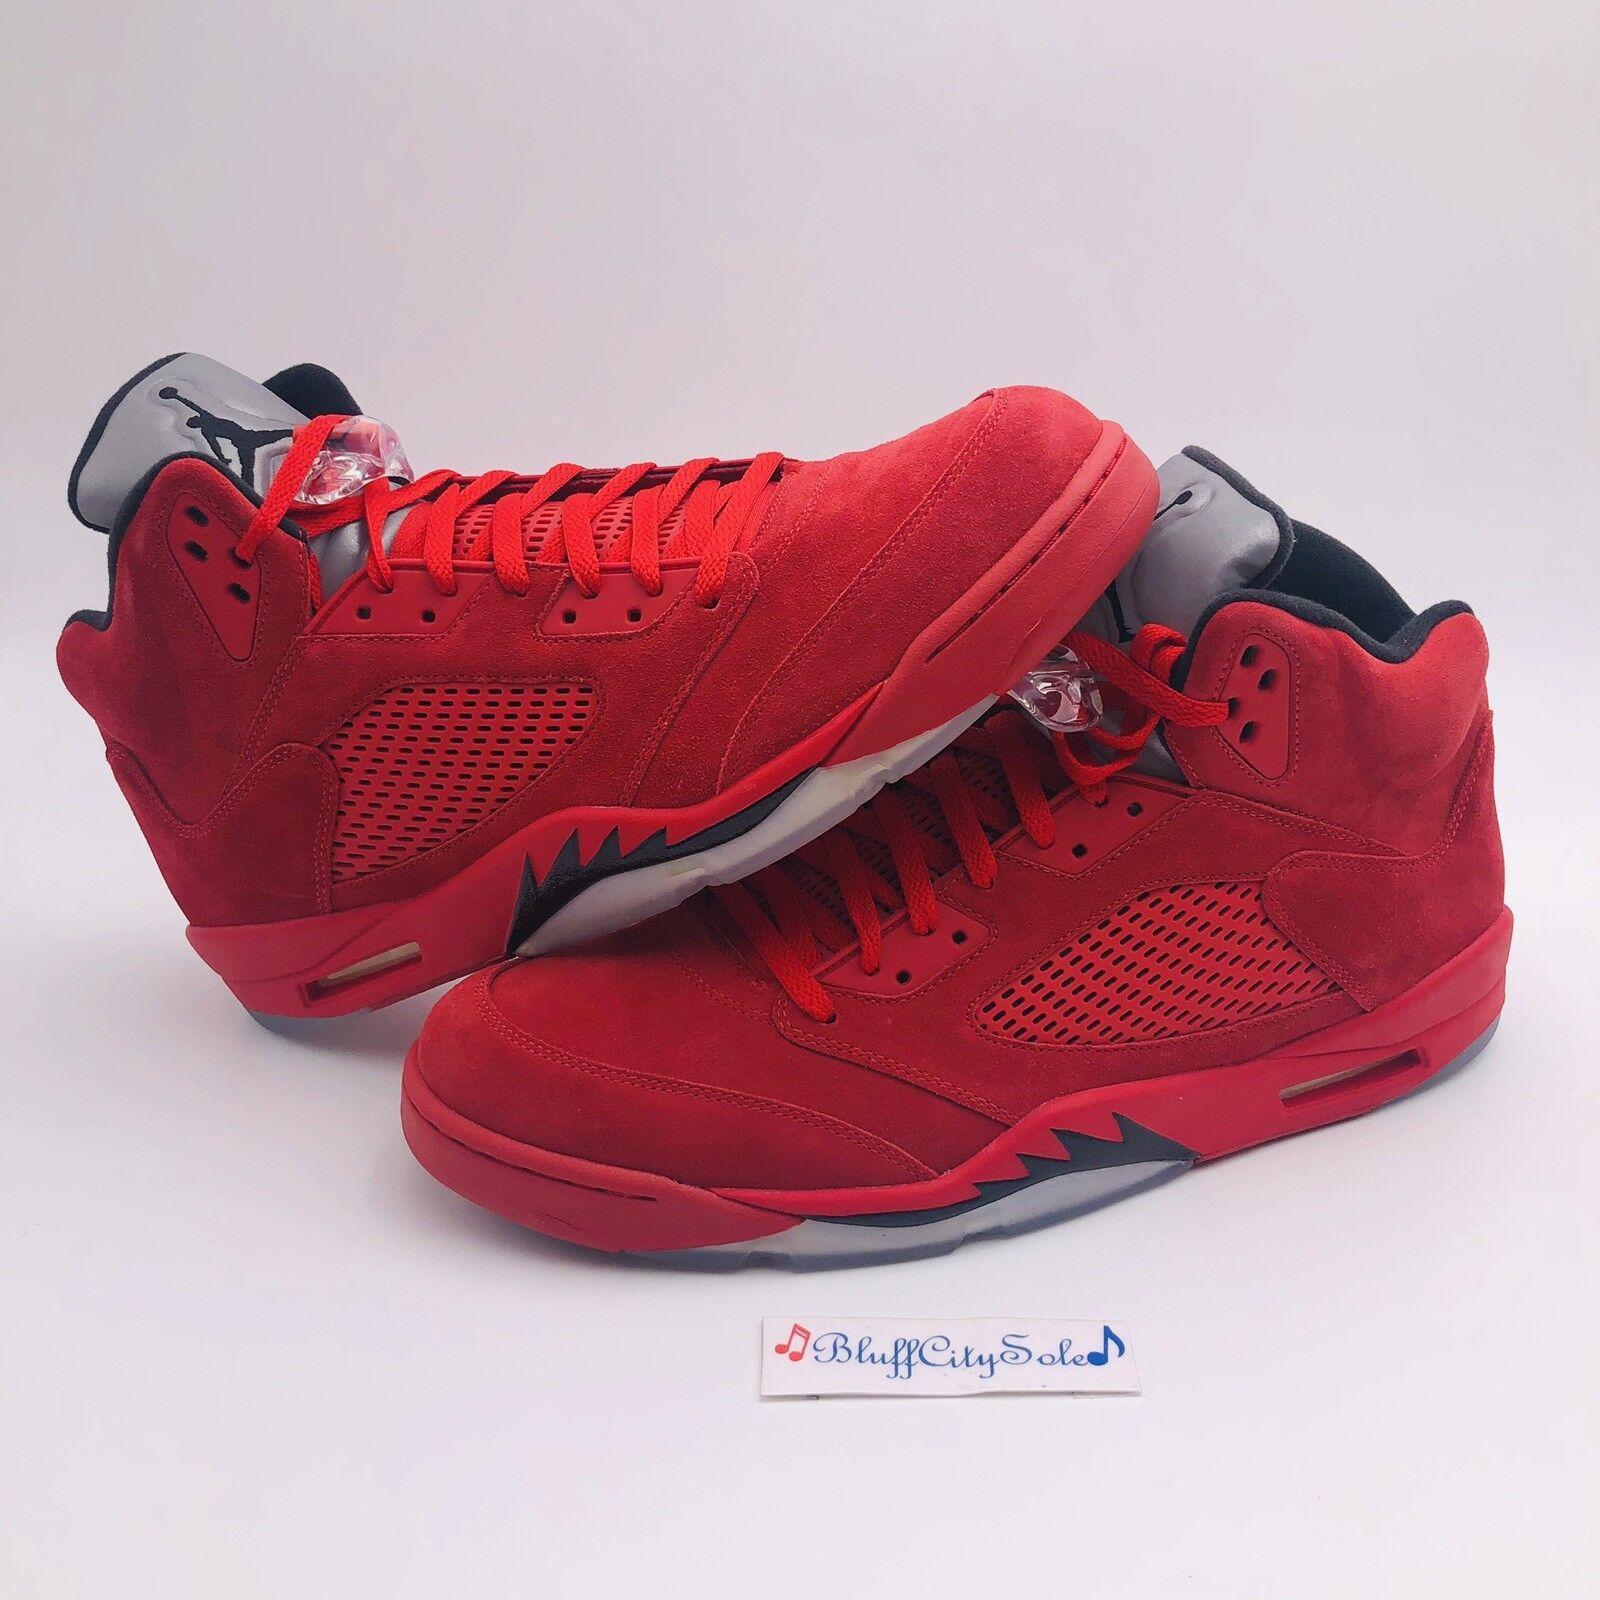 best sneakers 81b46 eb2f3 Nike Air Jordan Retro Retro Retro 5 Red Suede University Red Black 136027  602 Men s Size